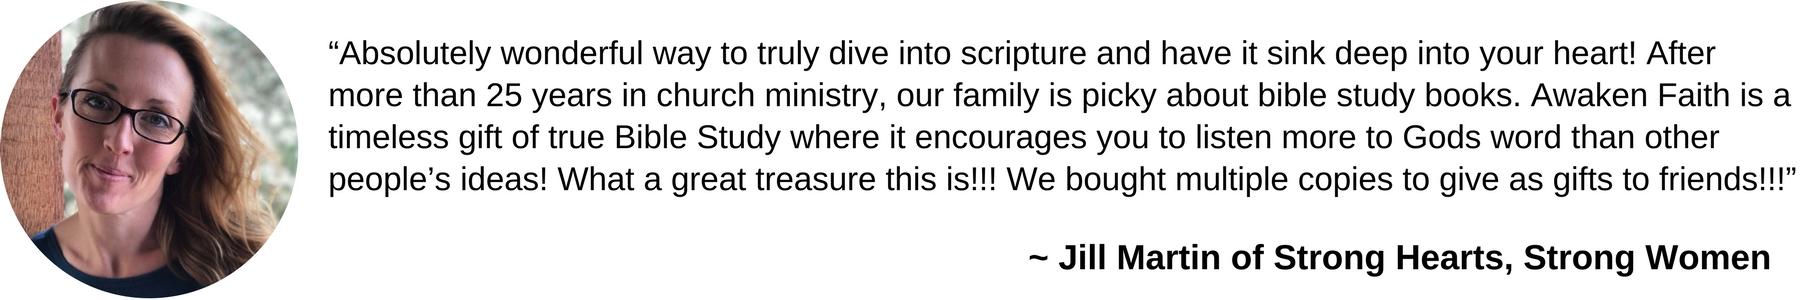 james-bible-study